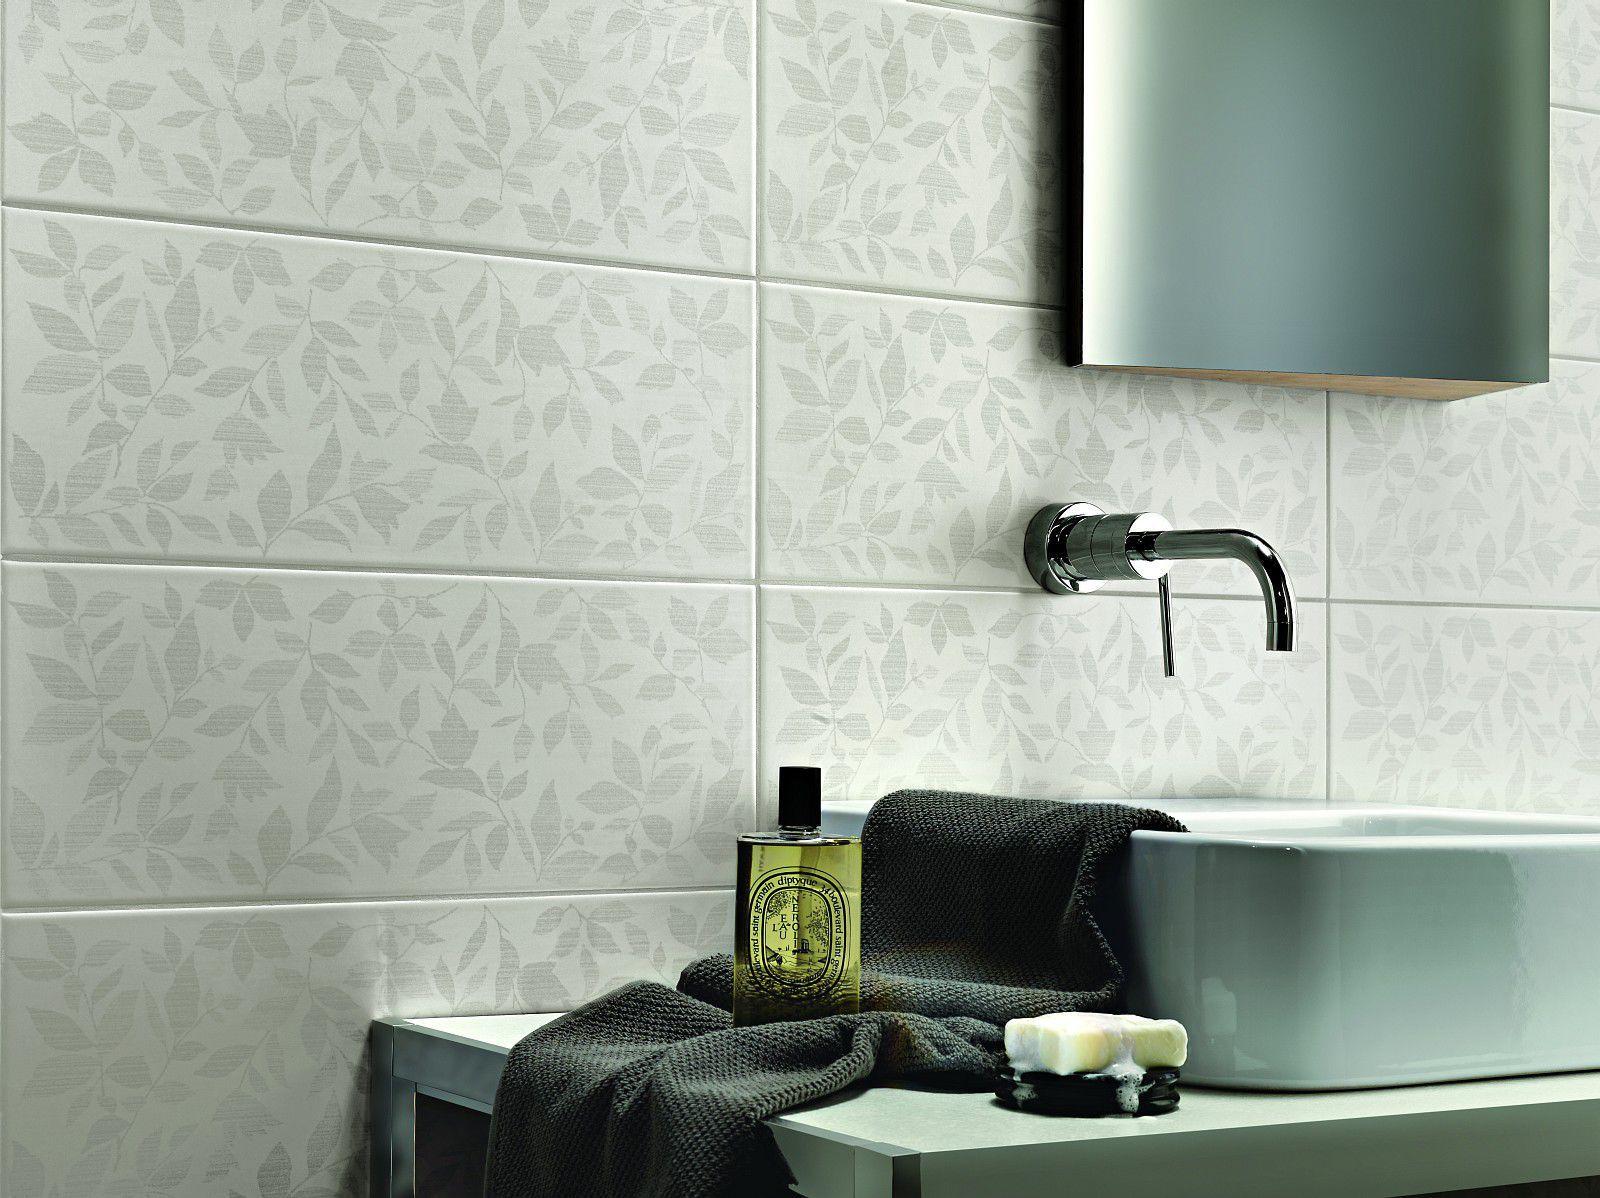 Magnificent 12X12 Acoustic Ceiling Tiles Huge 12X12 Vinyl Floor Tile Shaped 12X24 Ceramic Floor Tile 2 By 2 Ceiling Tiles Youthful 2X4 Ceiling Tiles Cheap Pink2X4 Subway Tile Backsplash Ragno Ceramic Tile   Columbialabels